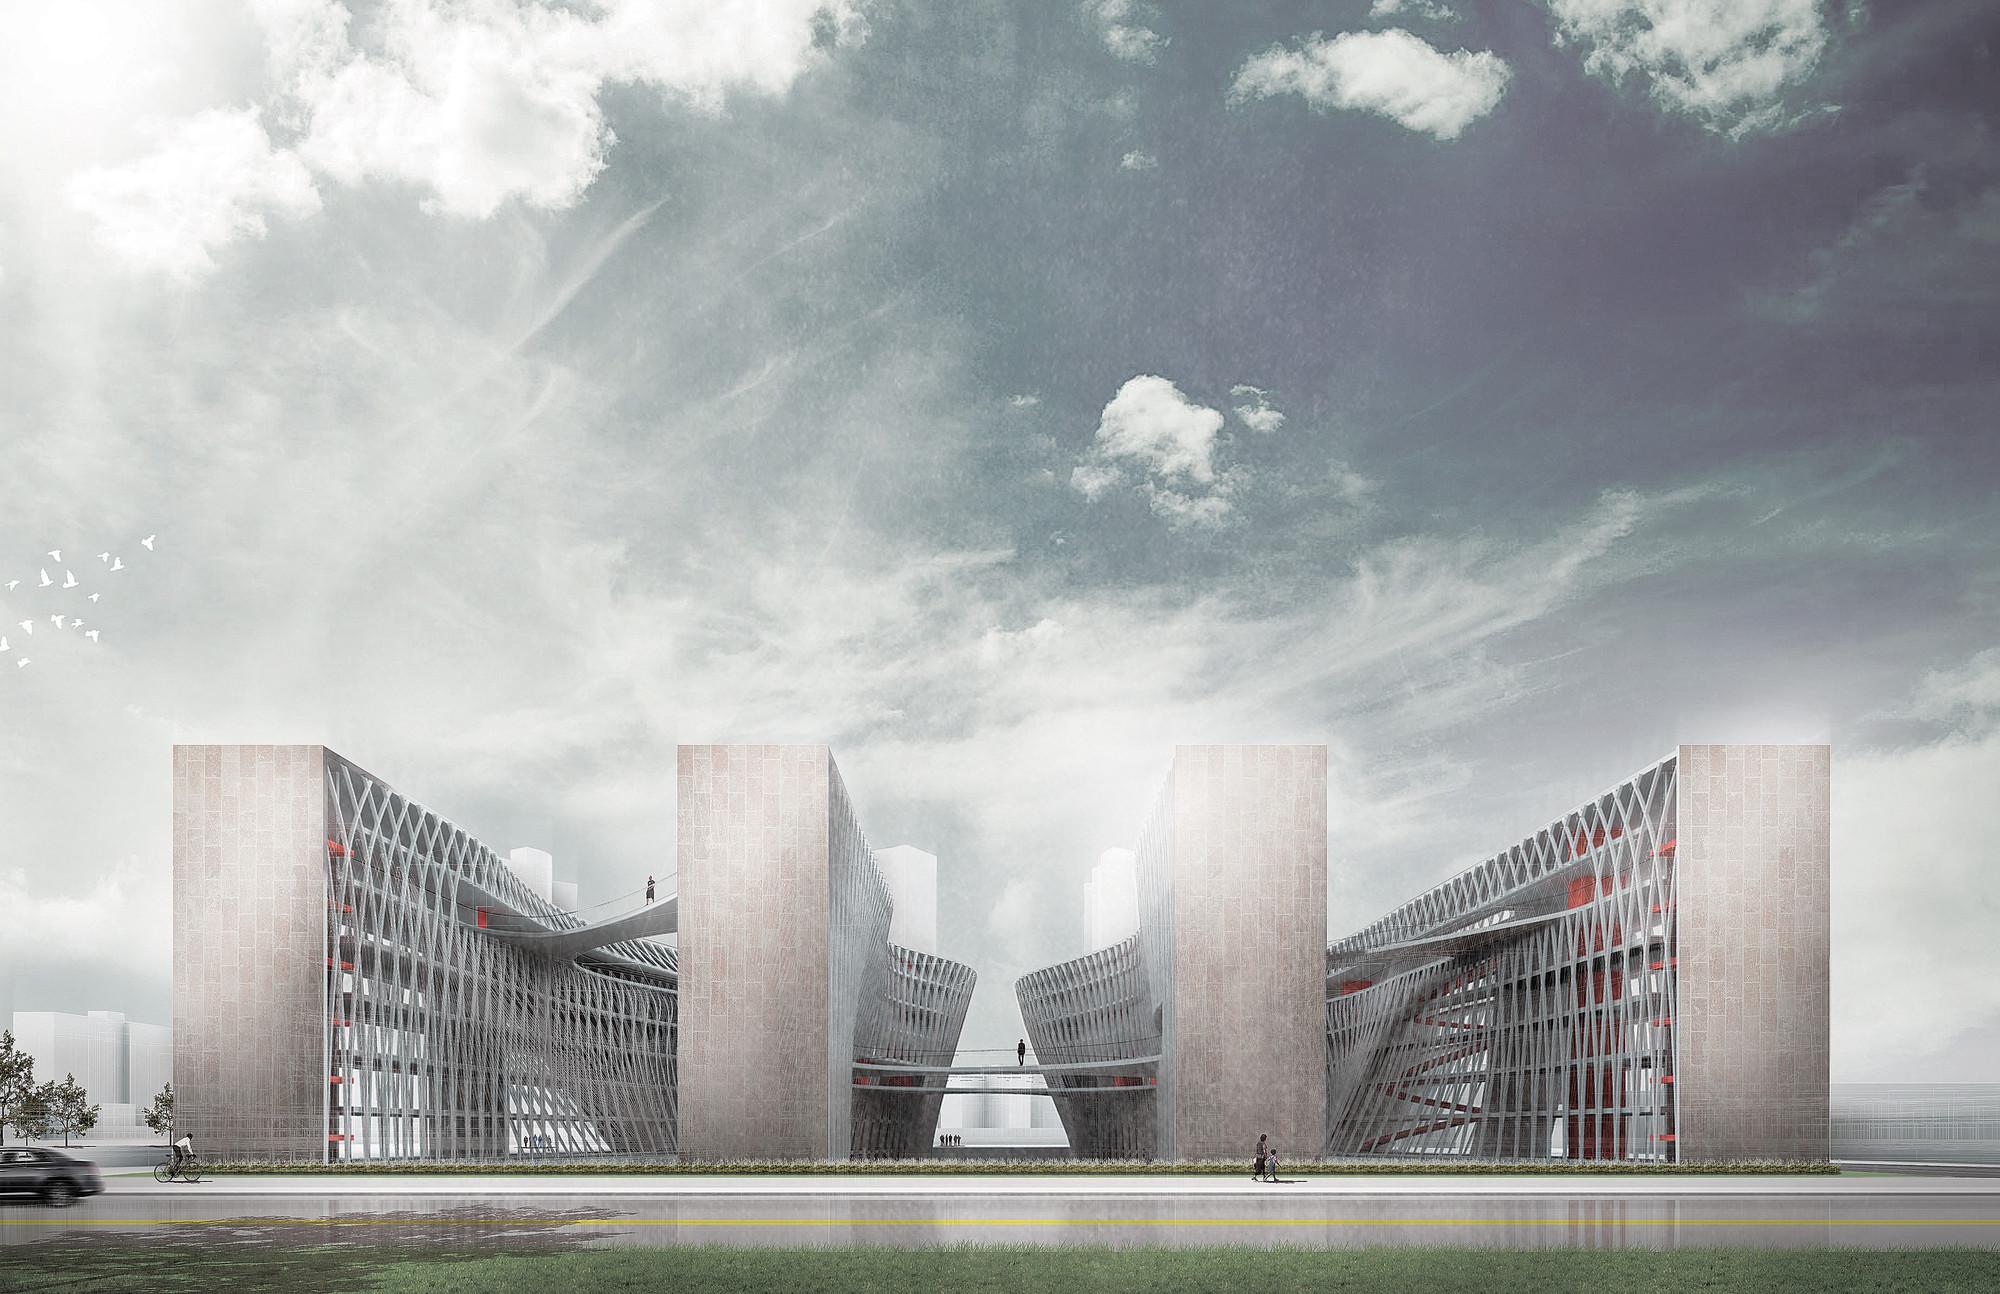 prison rendering